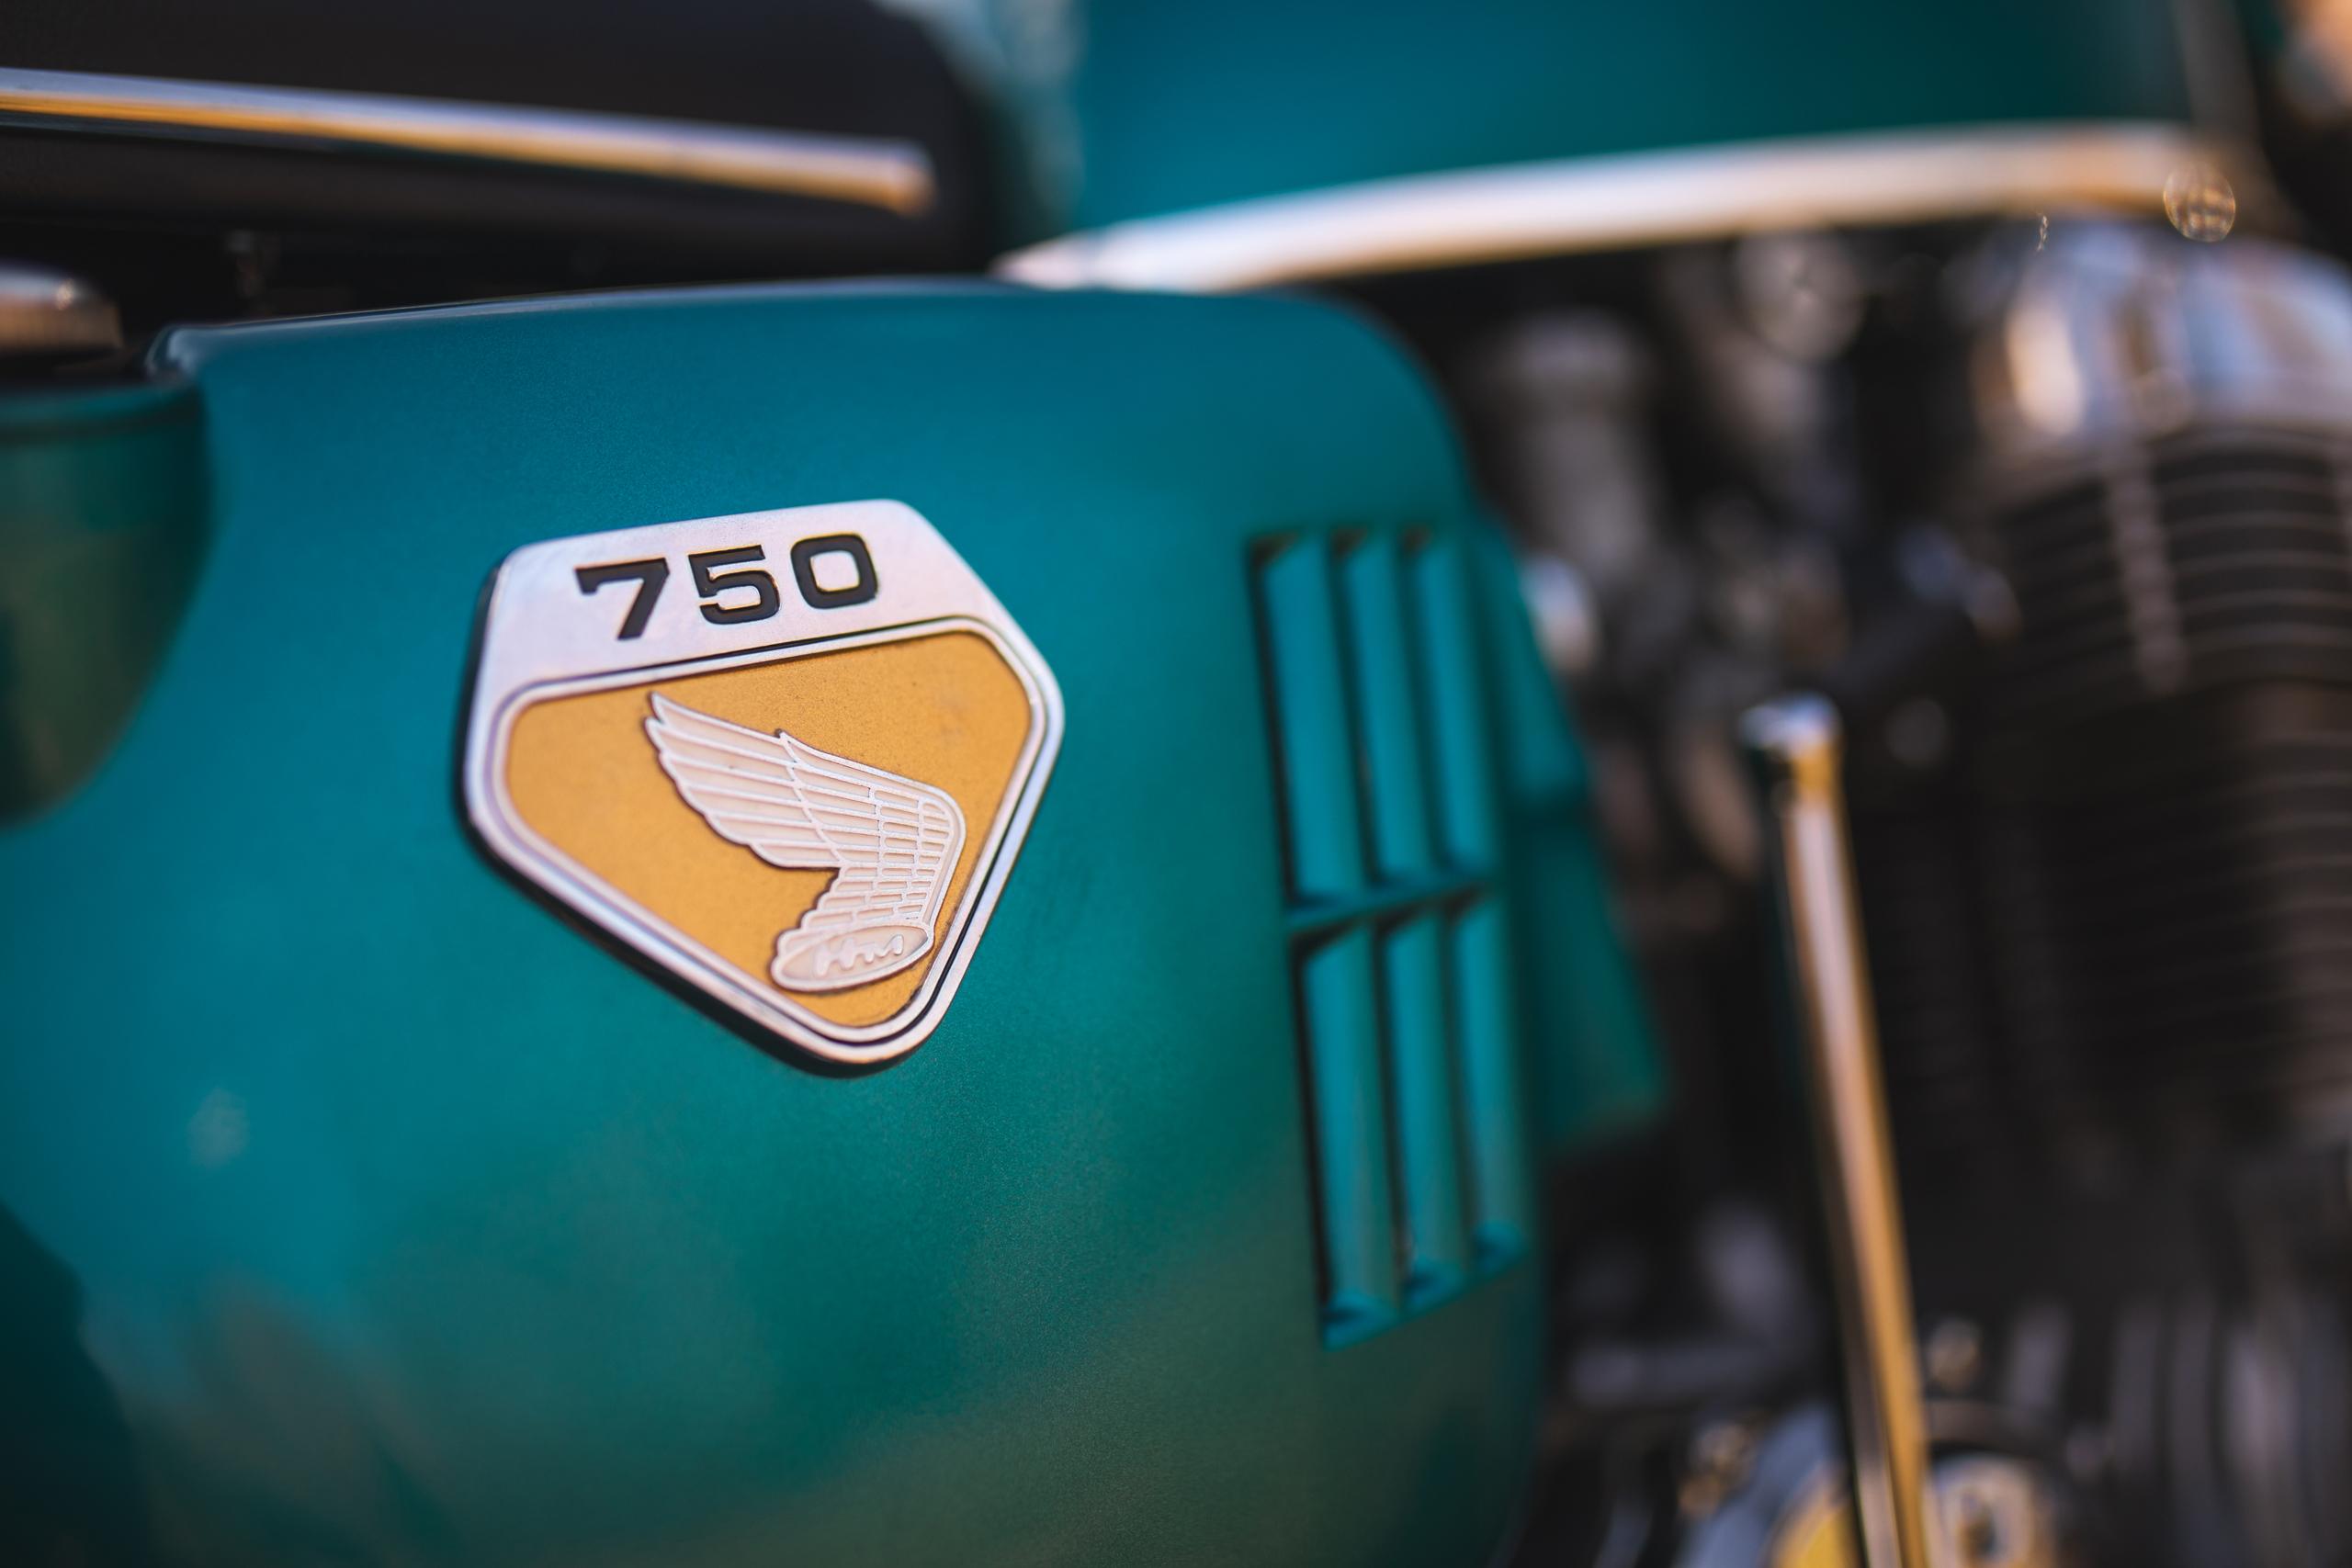 Honda CB750 badging